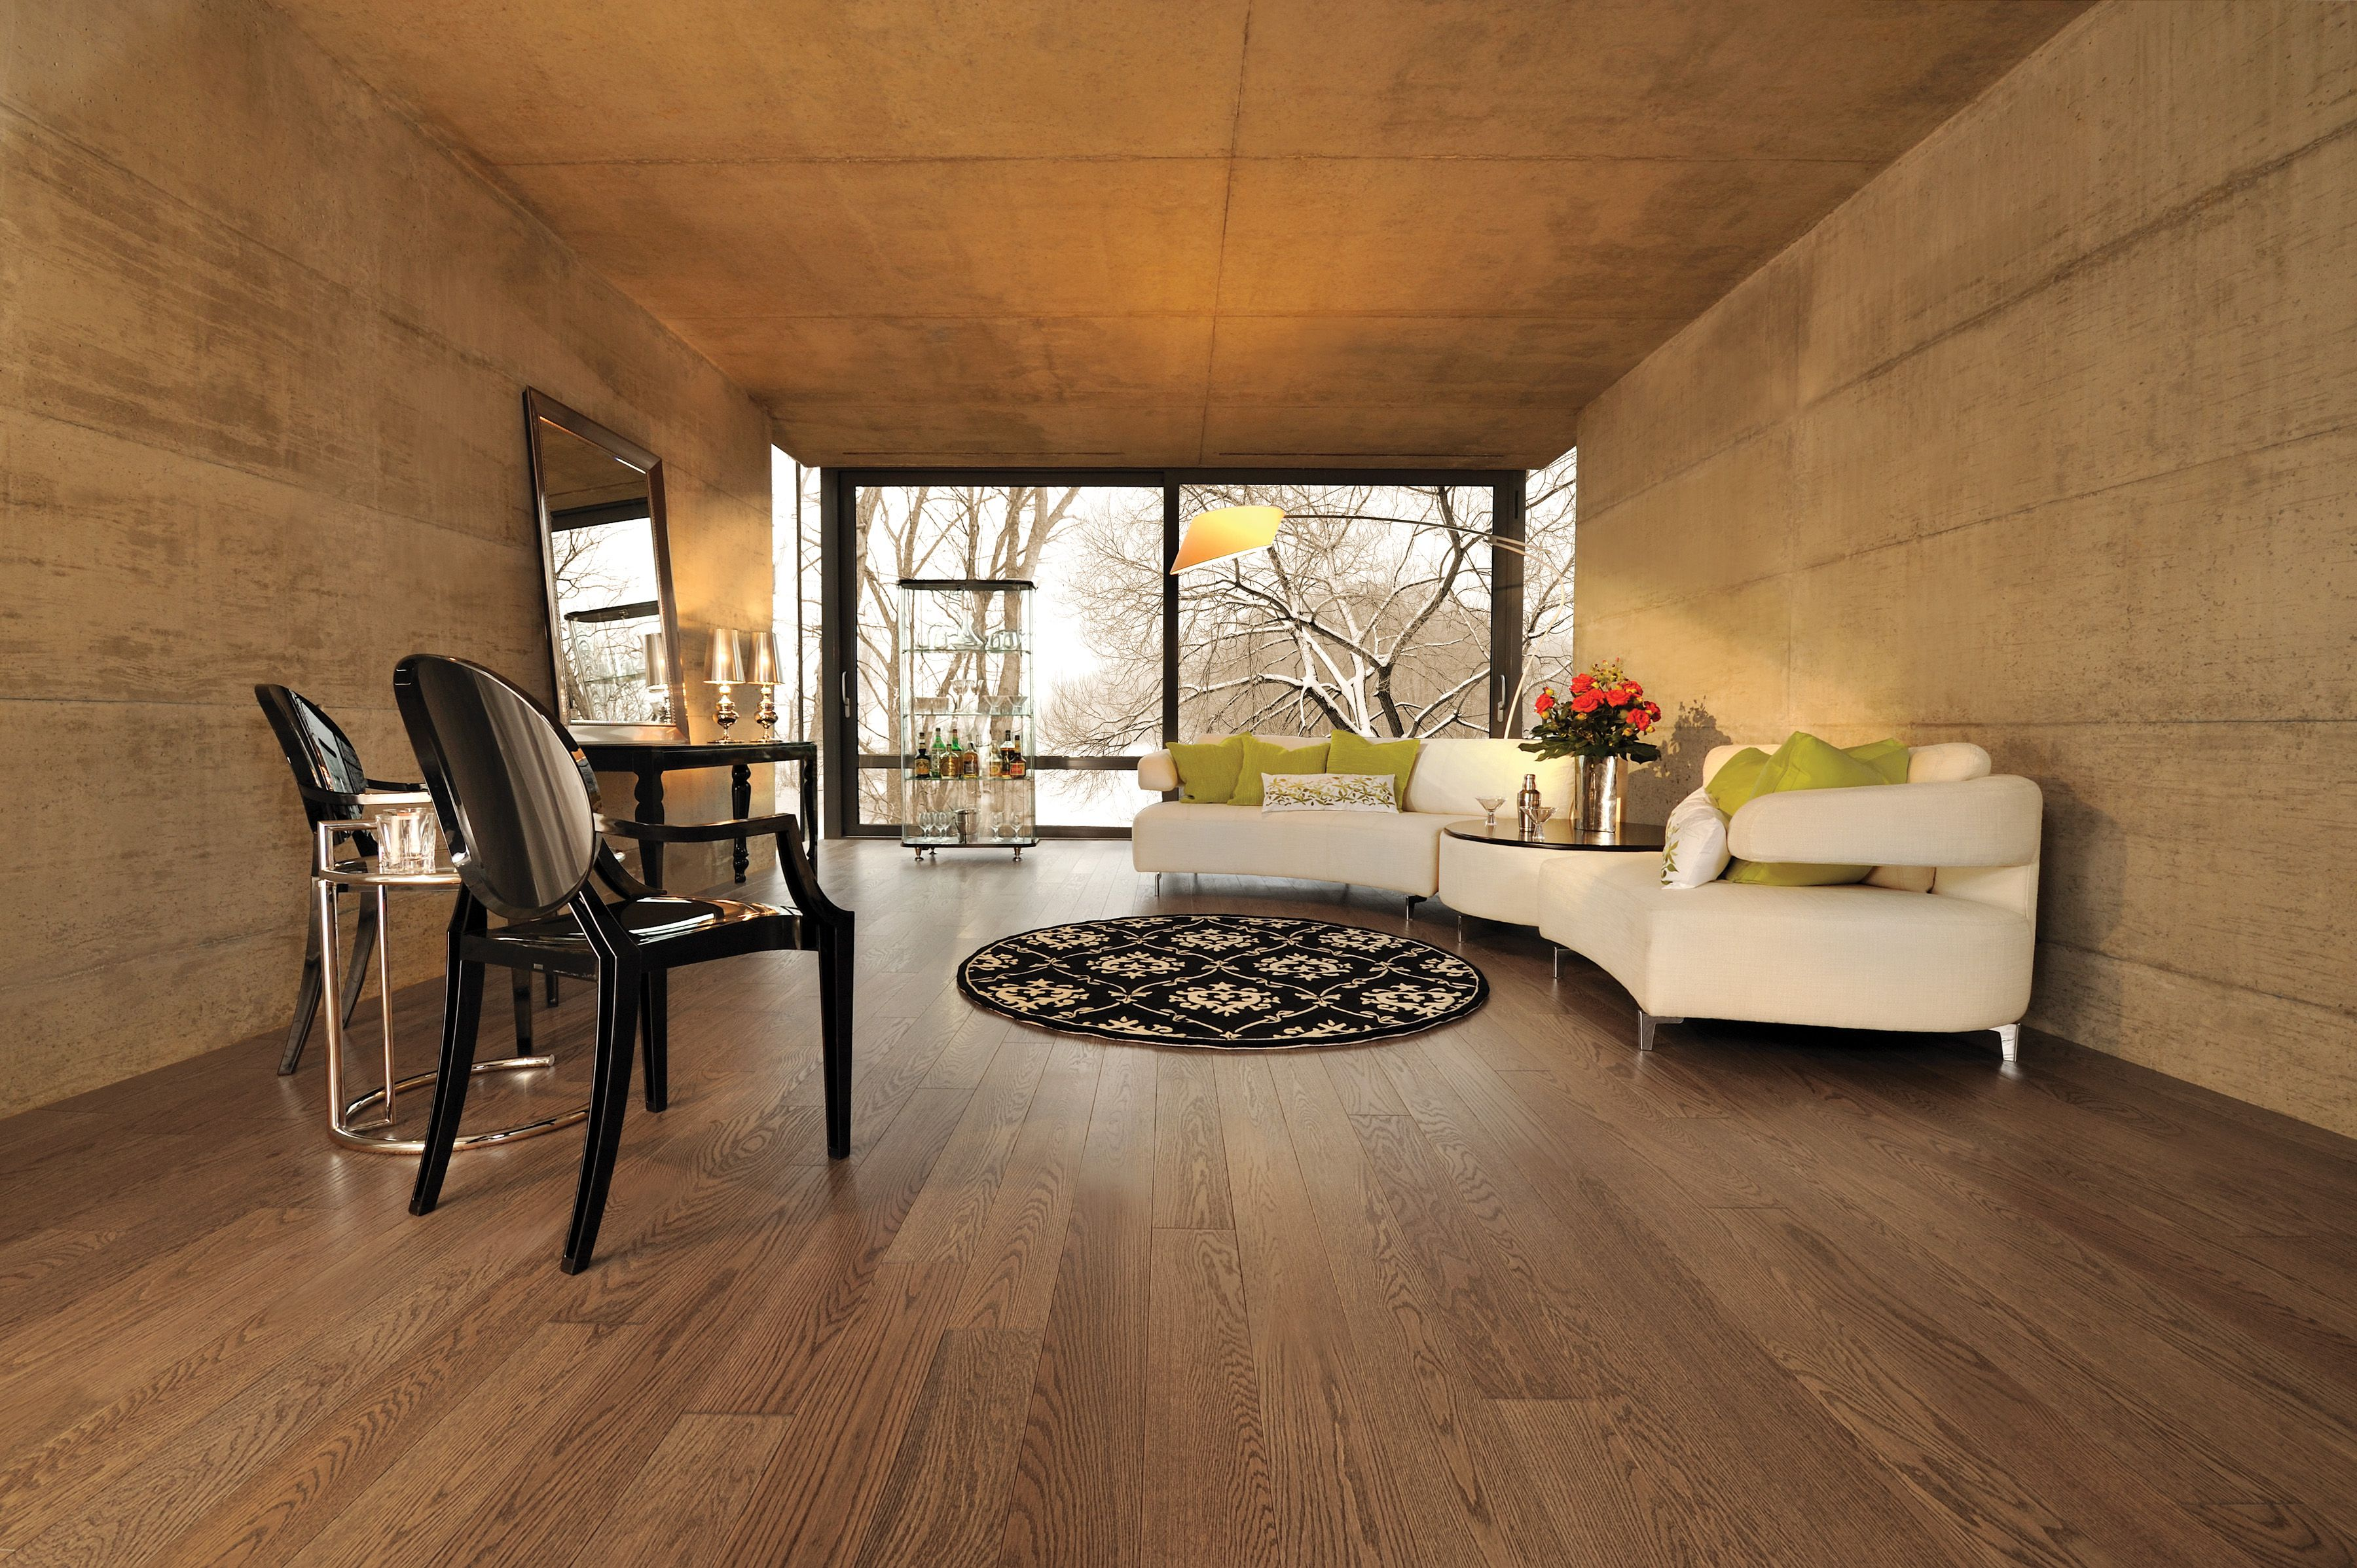 Bring Your Space To Life With Red Oak Terra Westonflooring Awardwinning Stripflooring Alivecollection Mirage Durable Flooring Hardwood Floors Flooring